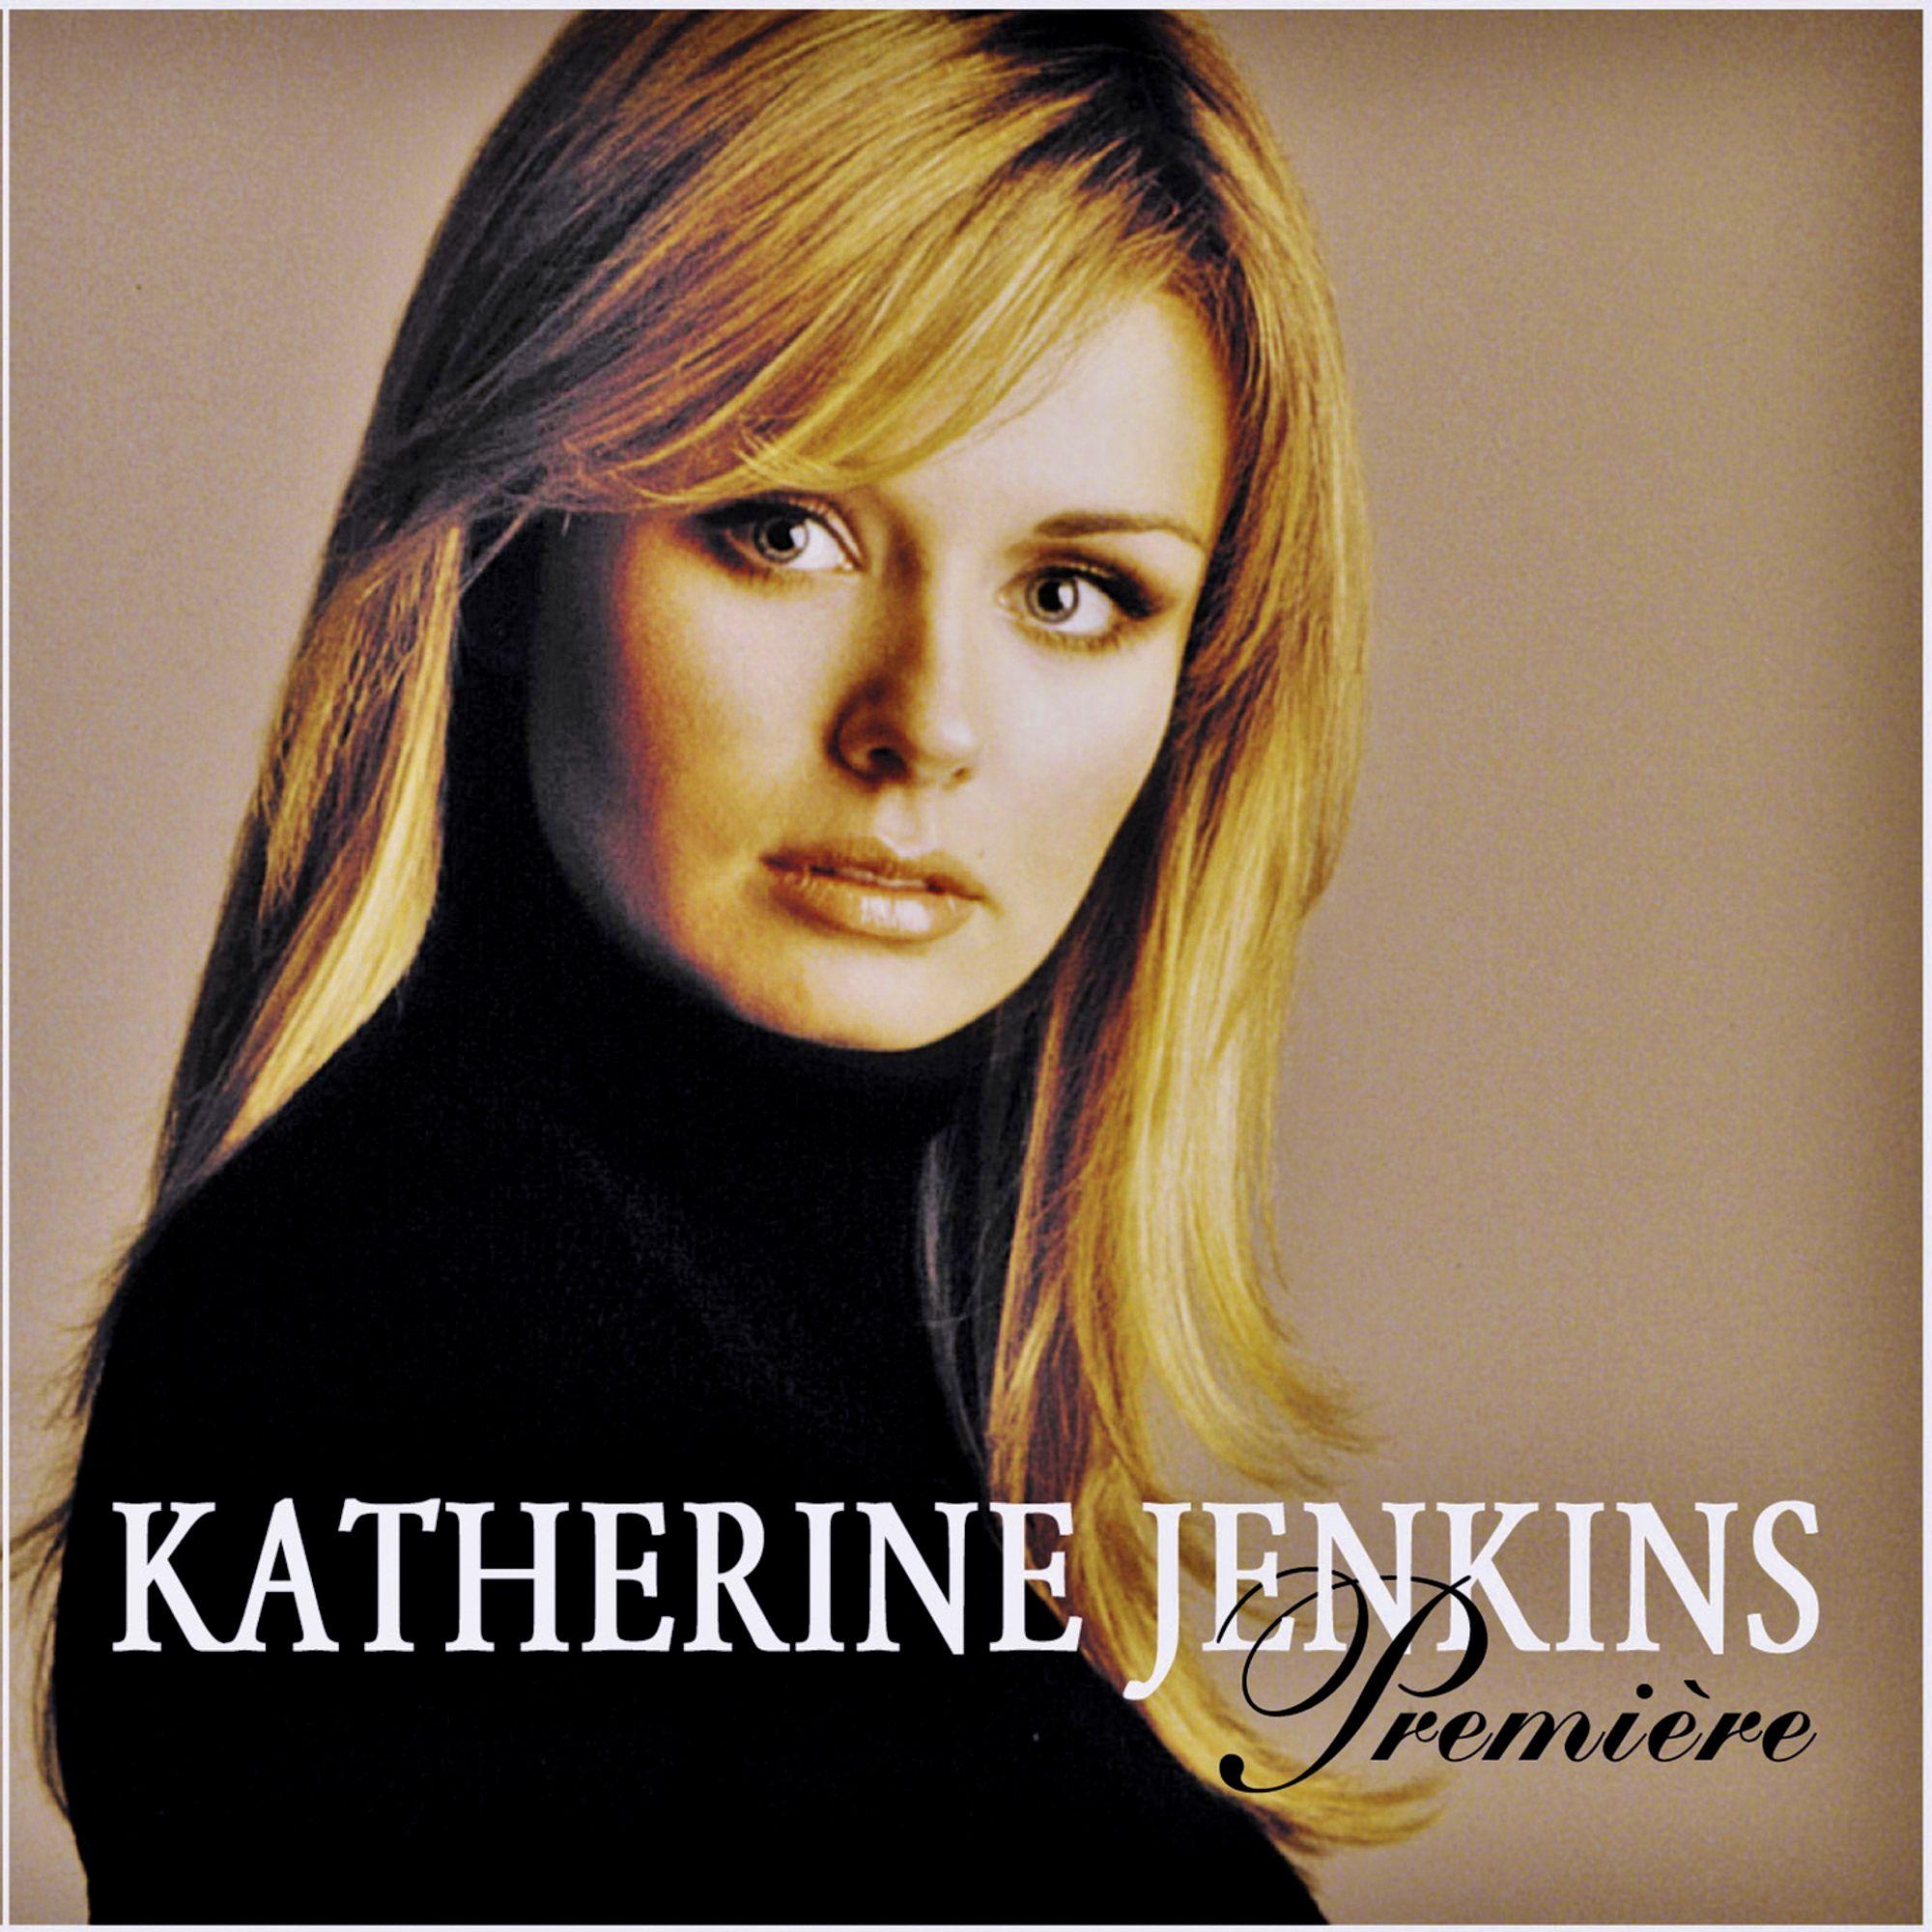 Katherine Jenkins - Premiere album cover